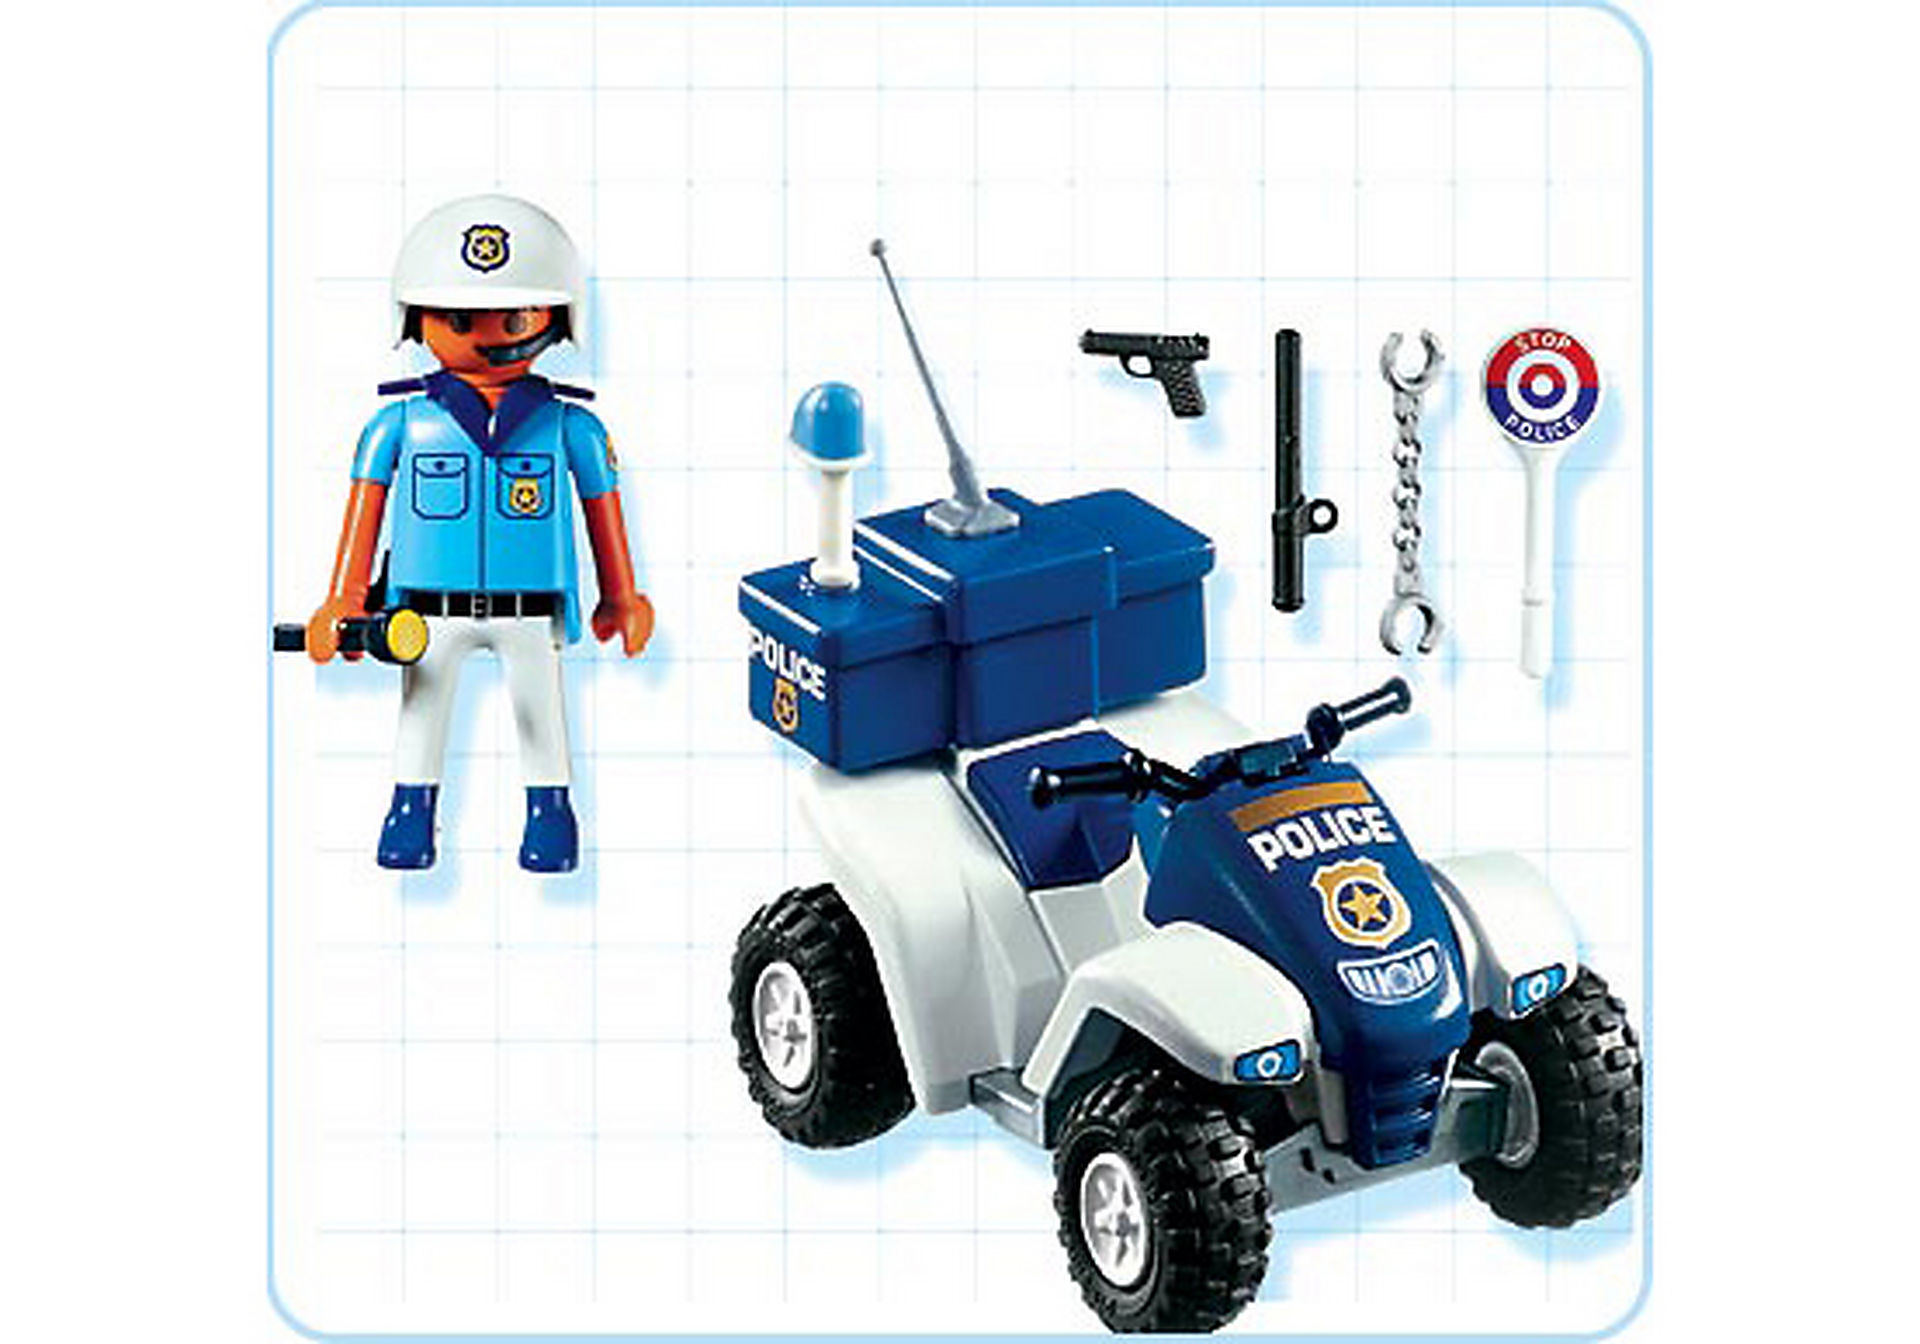 3655-B Police-Quad zoom image2